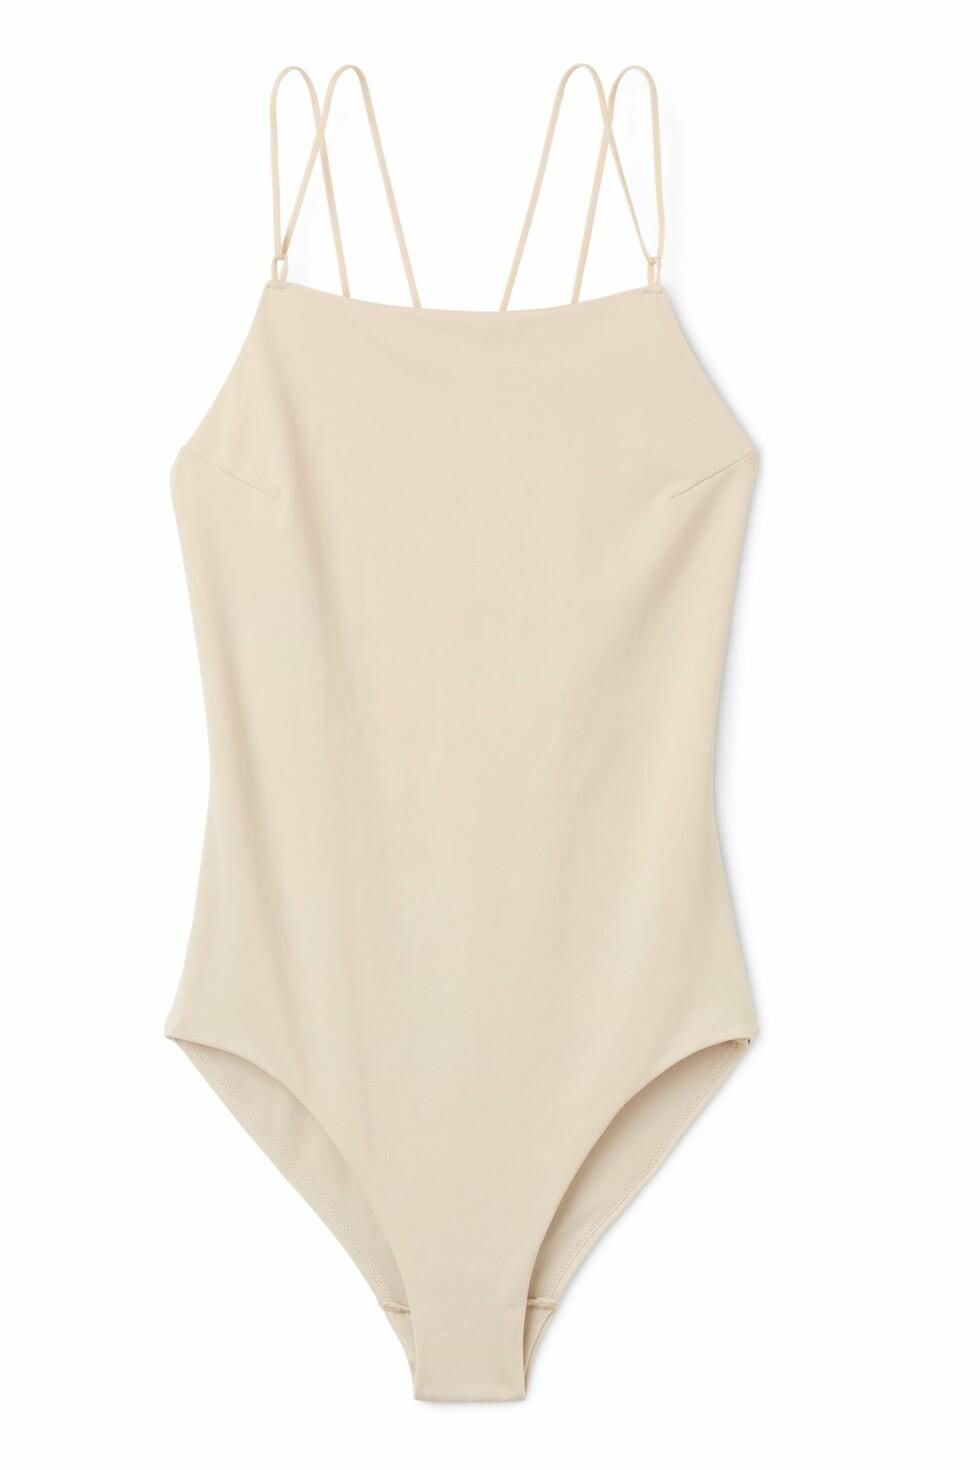 Badedrakt fra Weekday | kr 250 | http://shop.weekday.com/se/Womens_shop/Swimwear/All/Pangea_swimsuit/8278058-14033599.1#c-49929#Rel?PC=